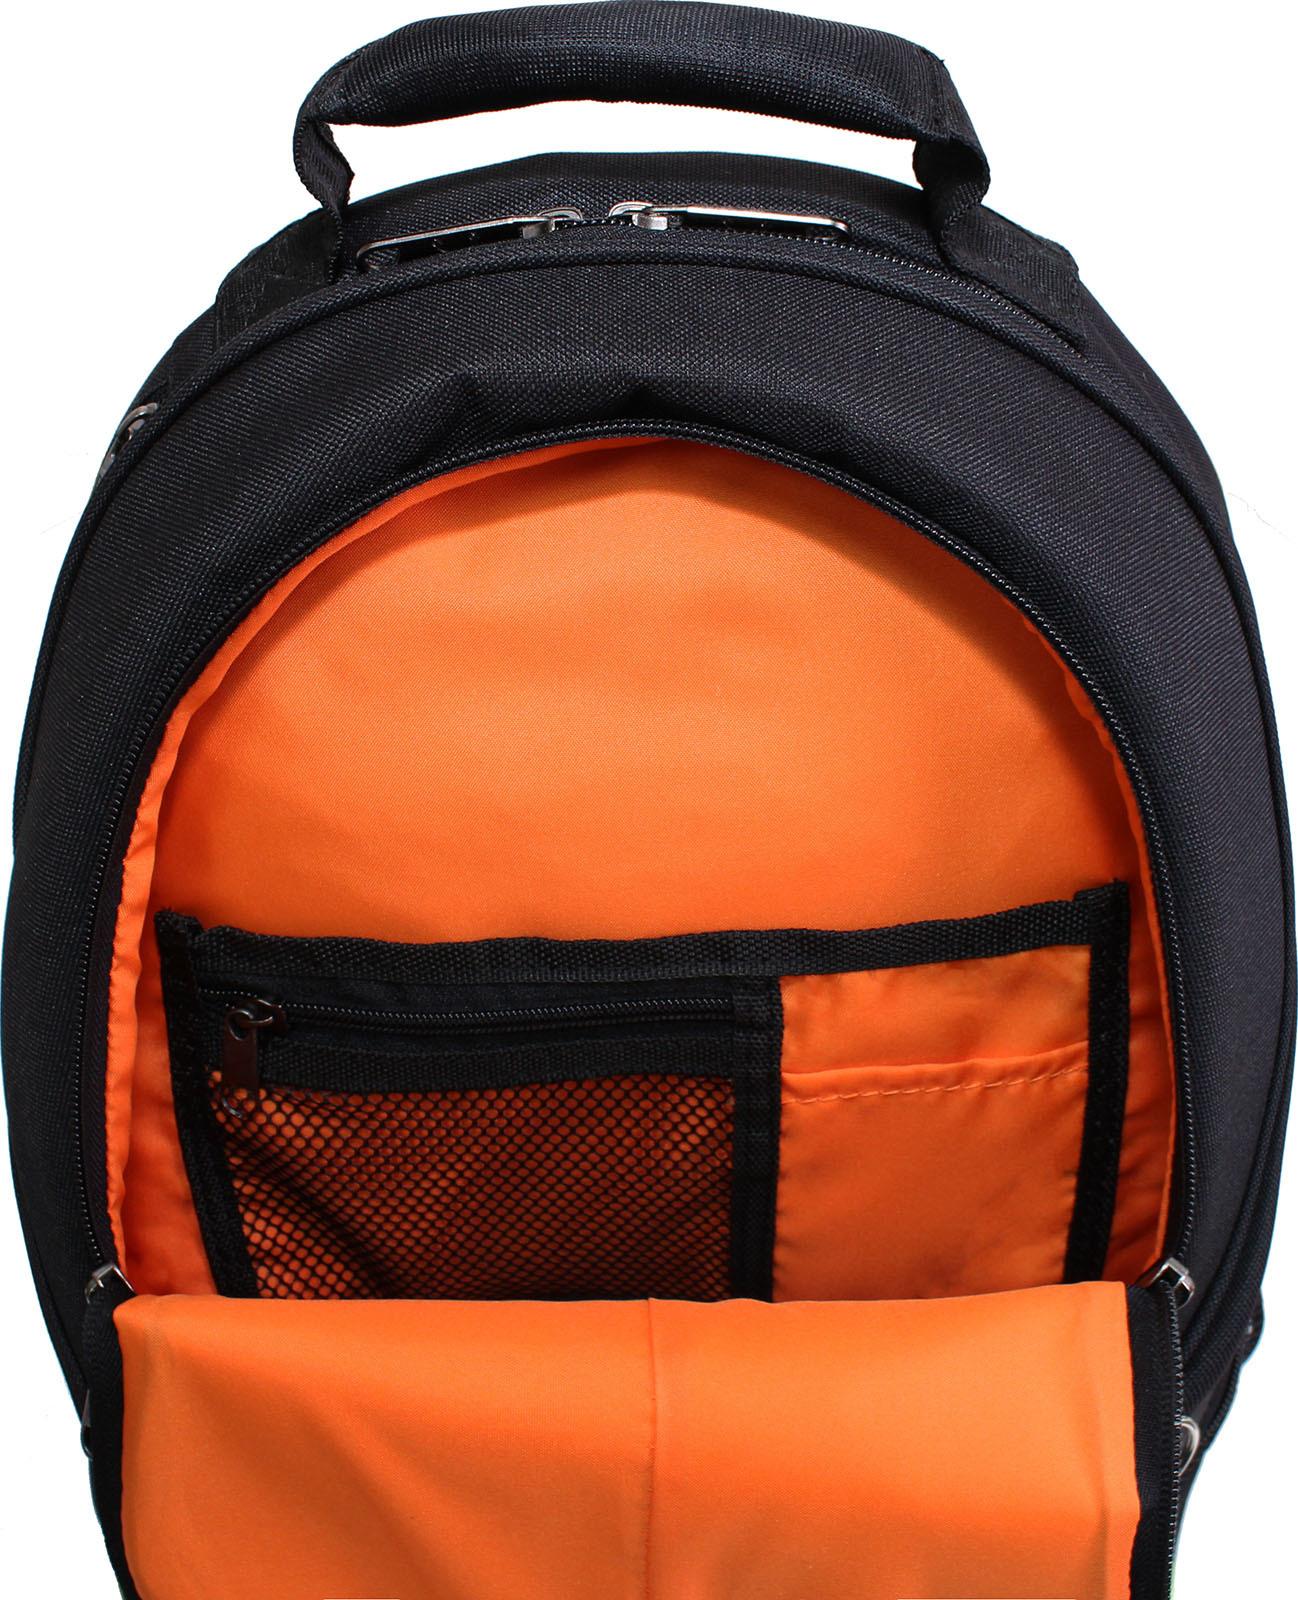 Рюкзак для ноутбука Bagland Рюкзак ZOOTY 24 л. Чёрный (00531662) фото 4